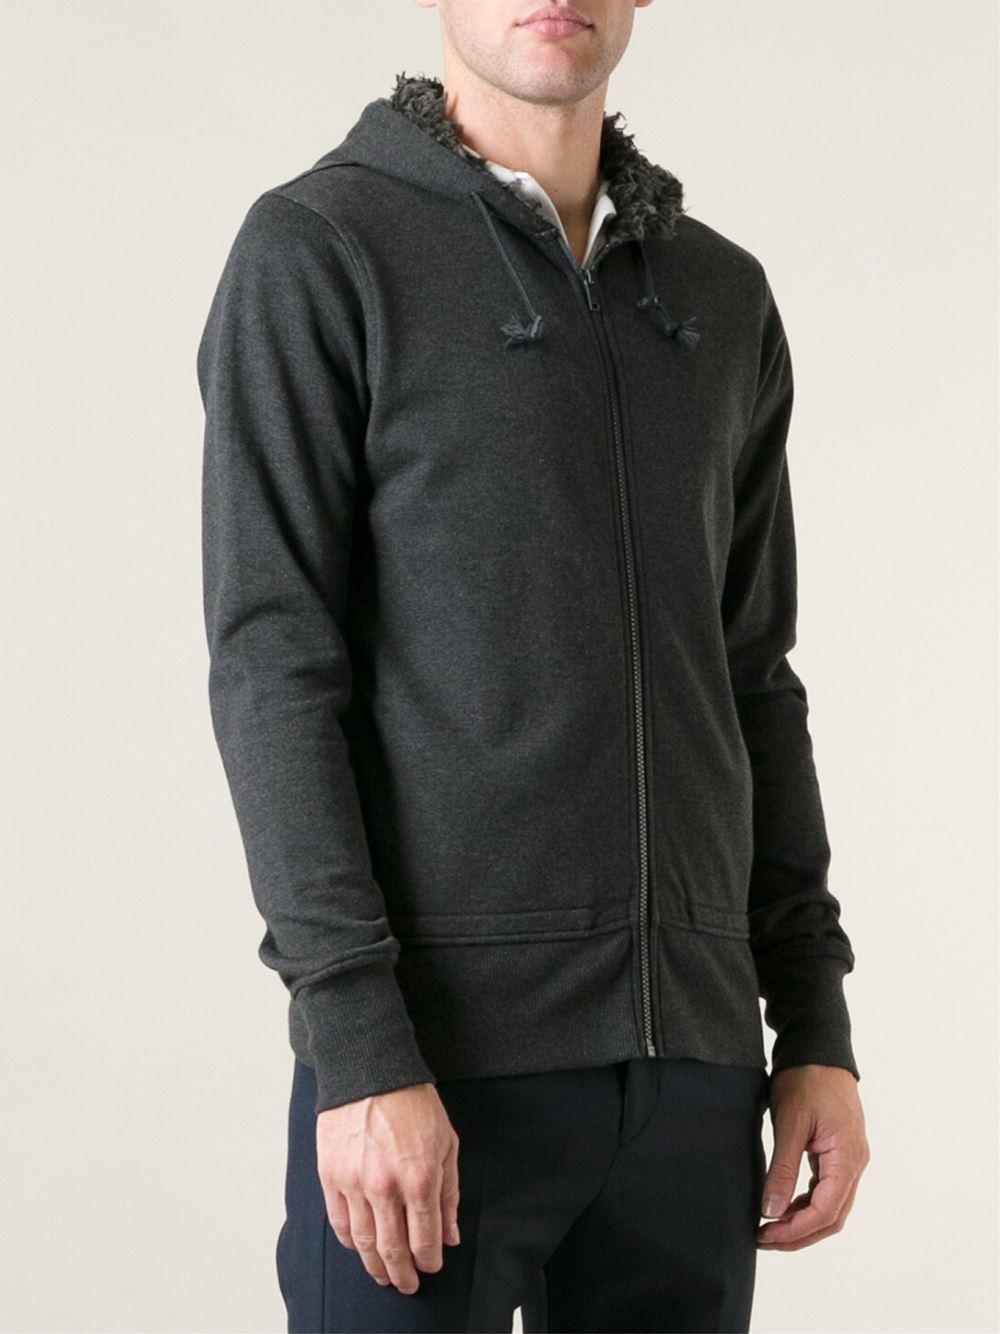 Y-3 Faux-Fur Lined Hoodie In Gray For Men Grey  Lyst-4793